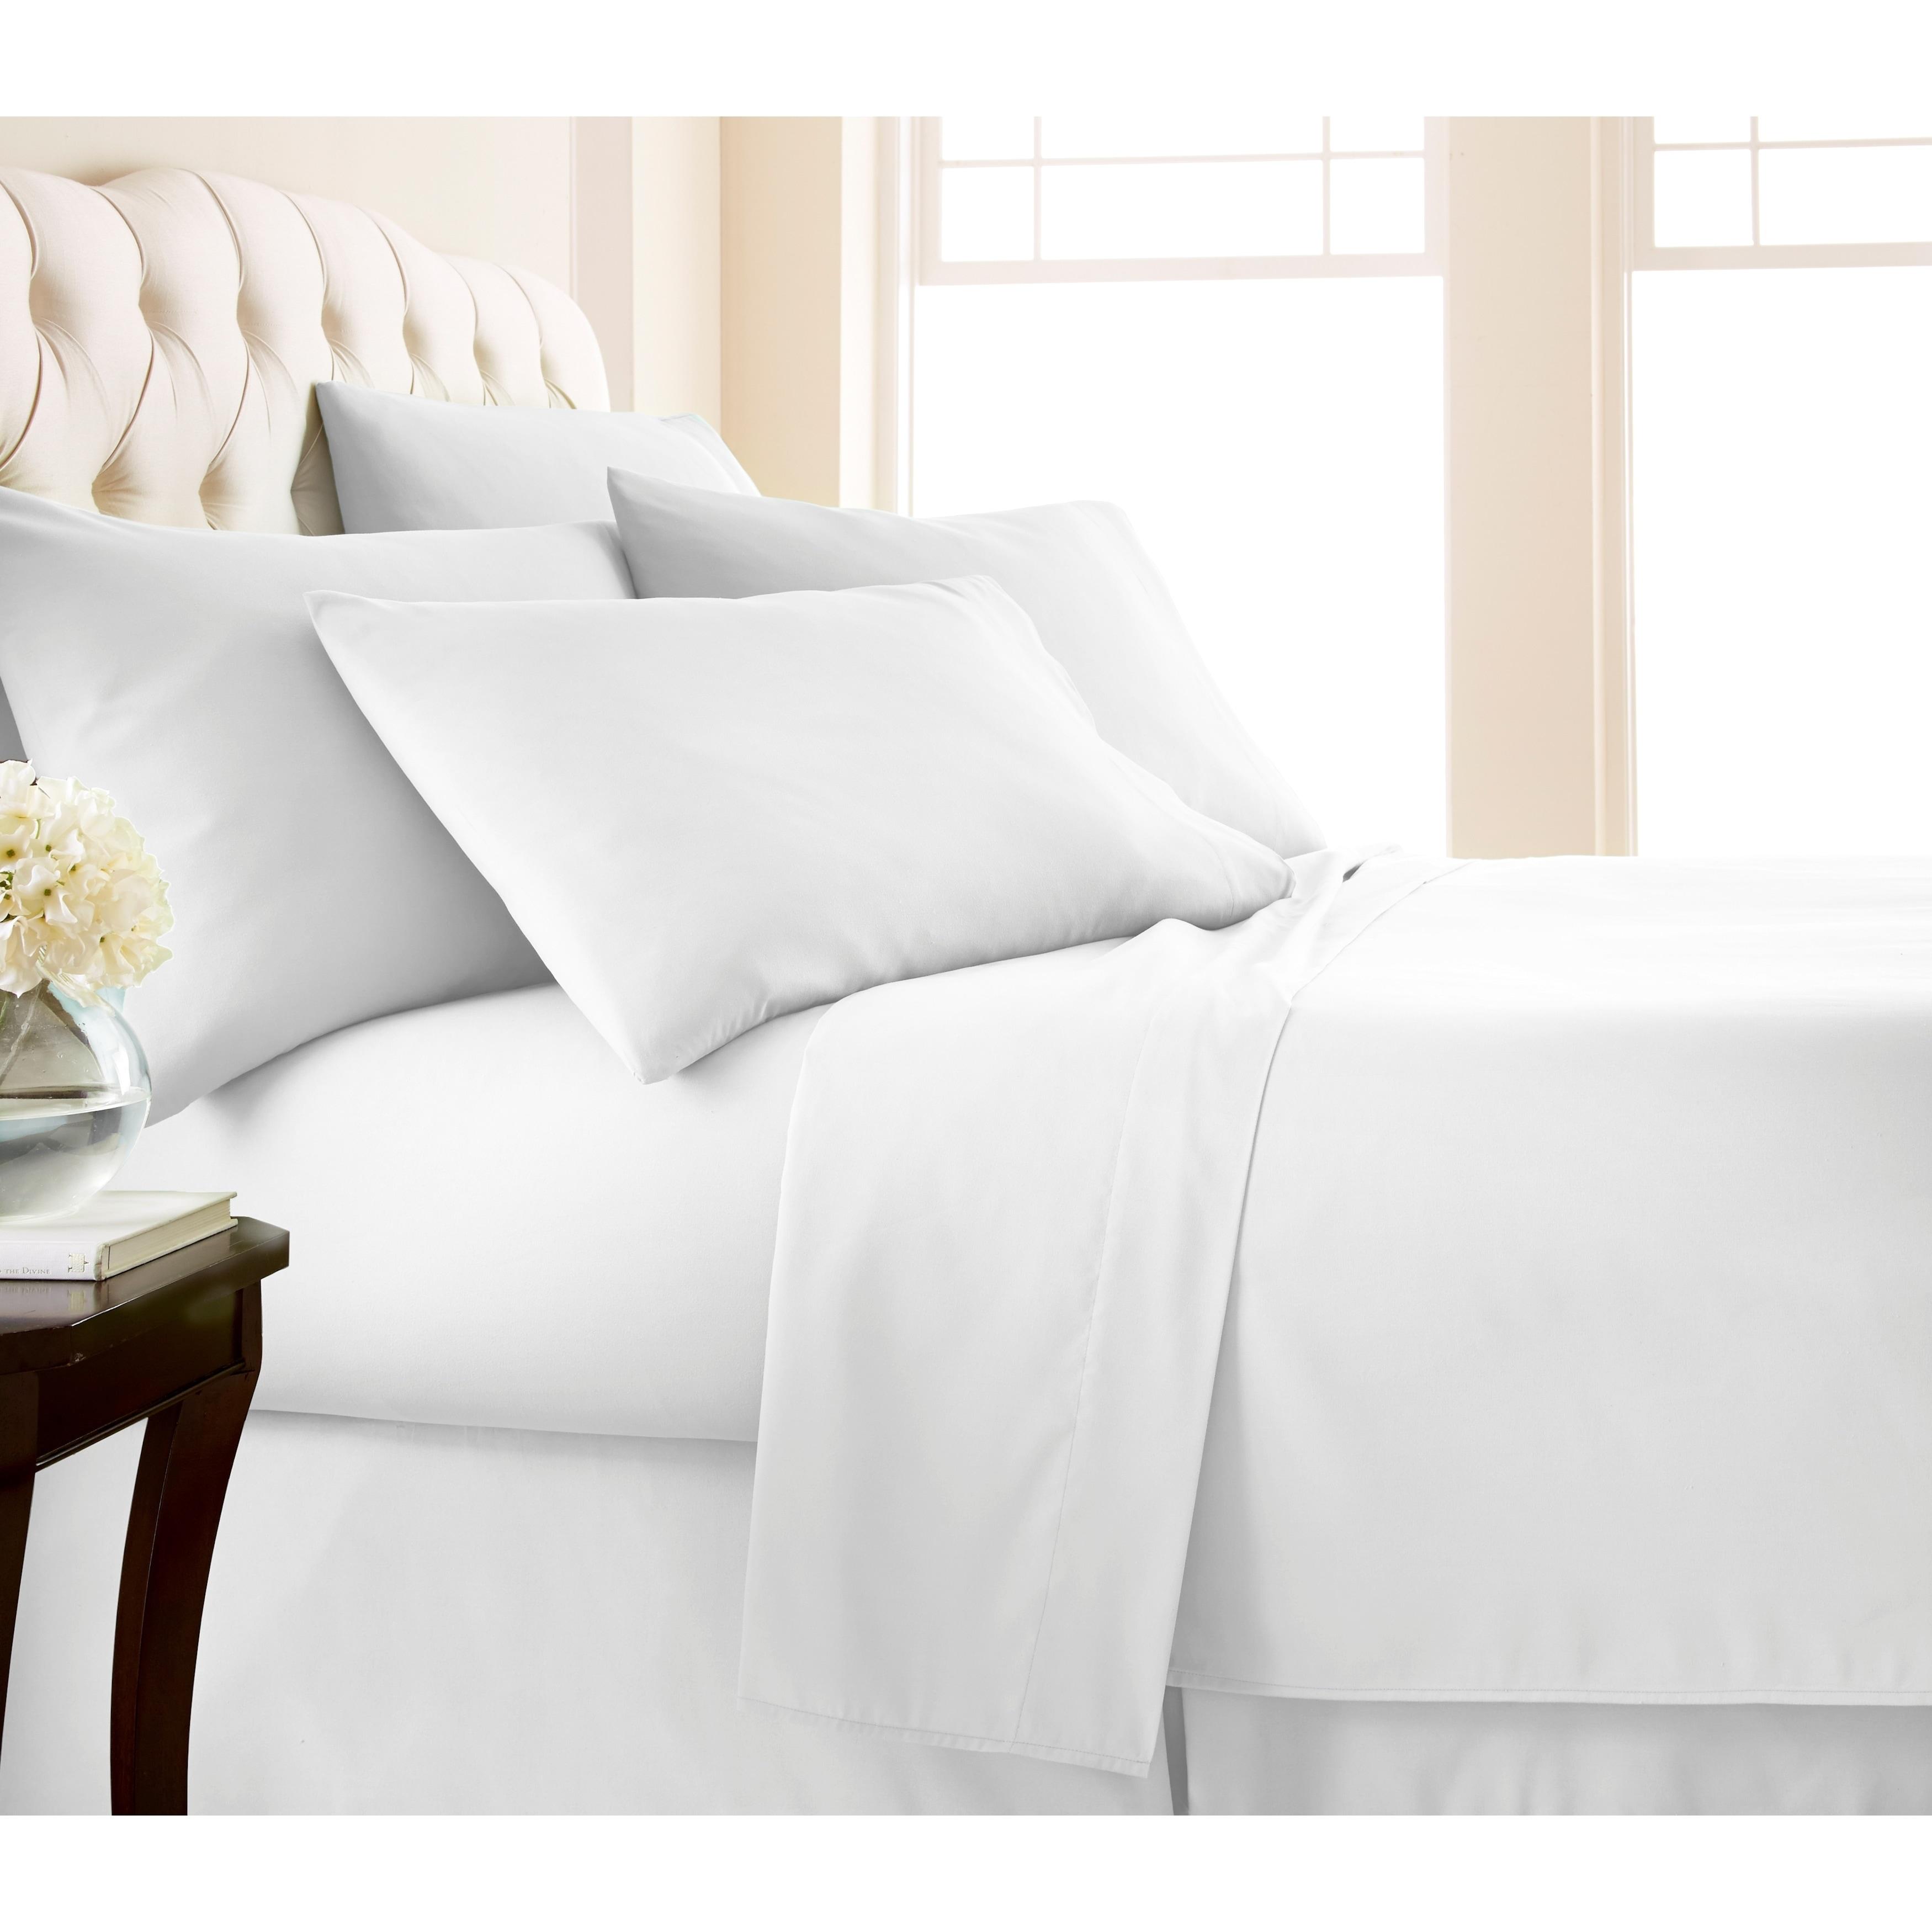 Shop Adjustable Mattress Split King Ultra Soft 7 Piece Bed Sheet